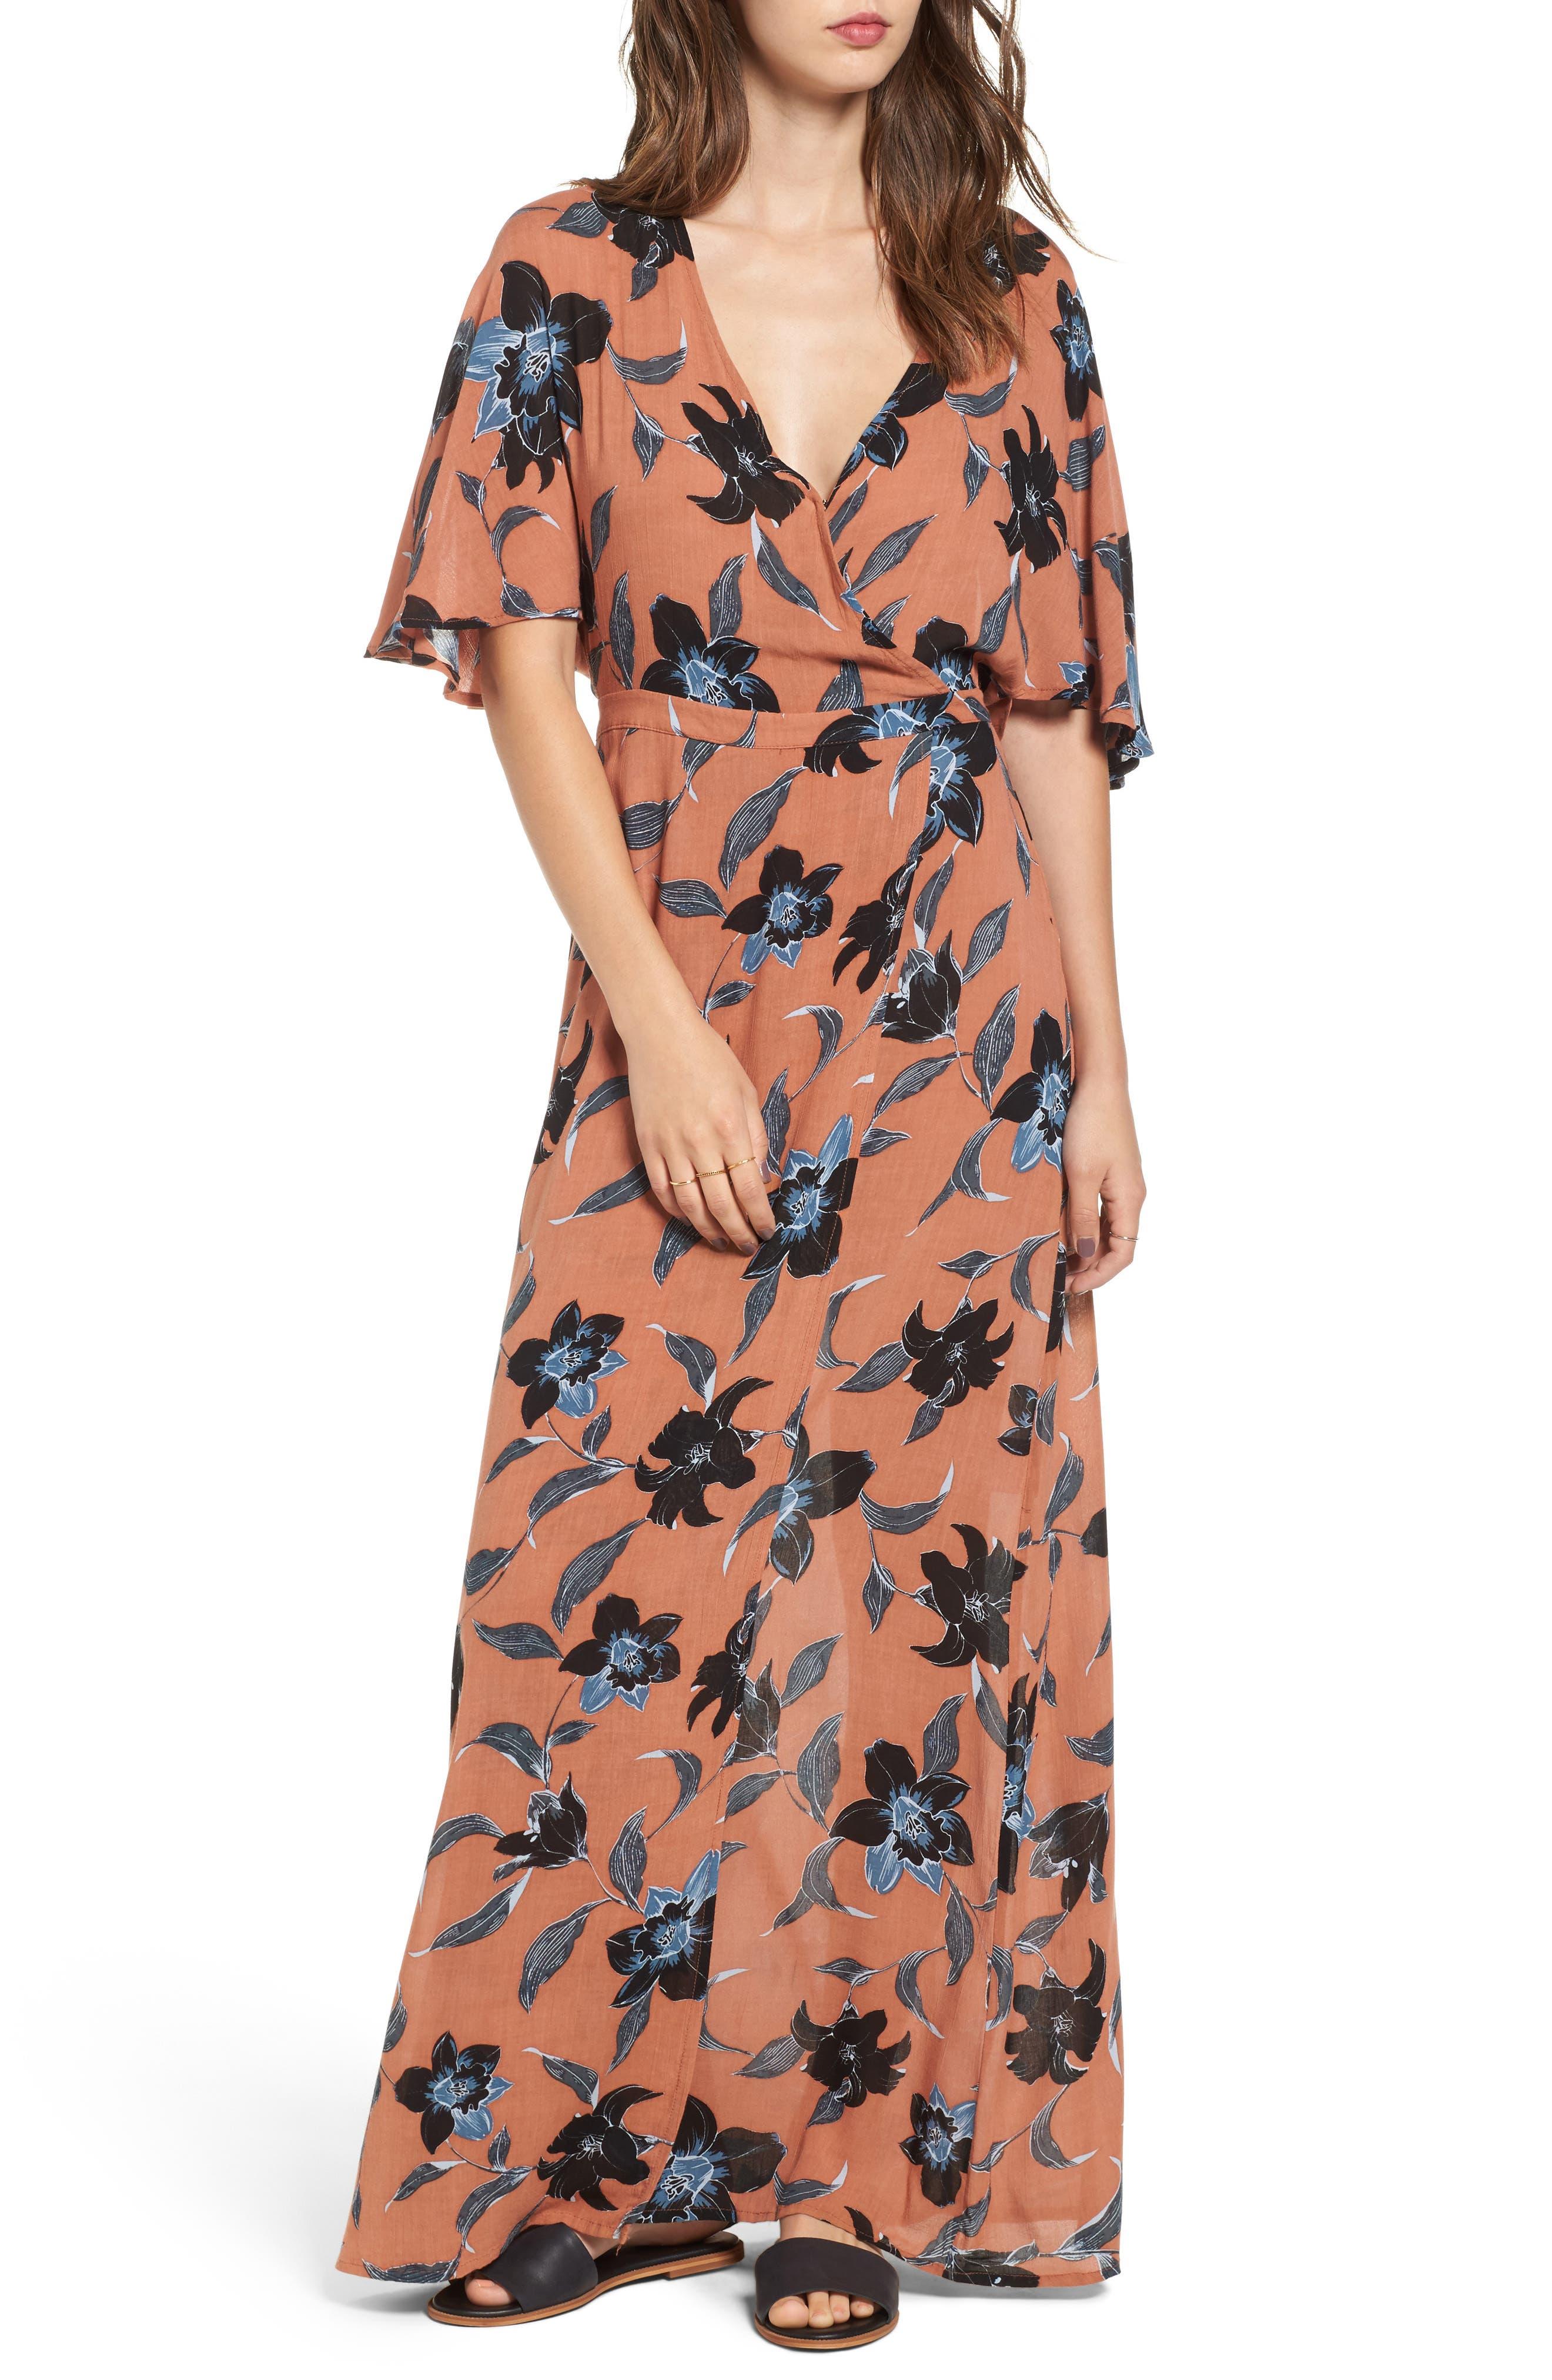 FAITHFULL THE BRAND Salt Spring Maxi Dress